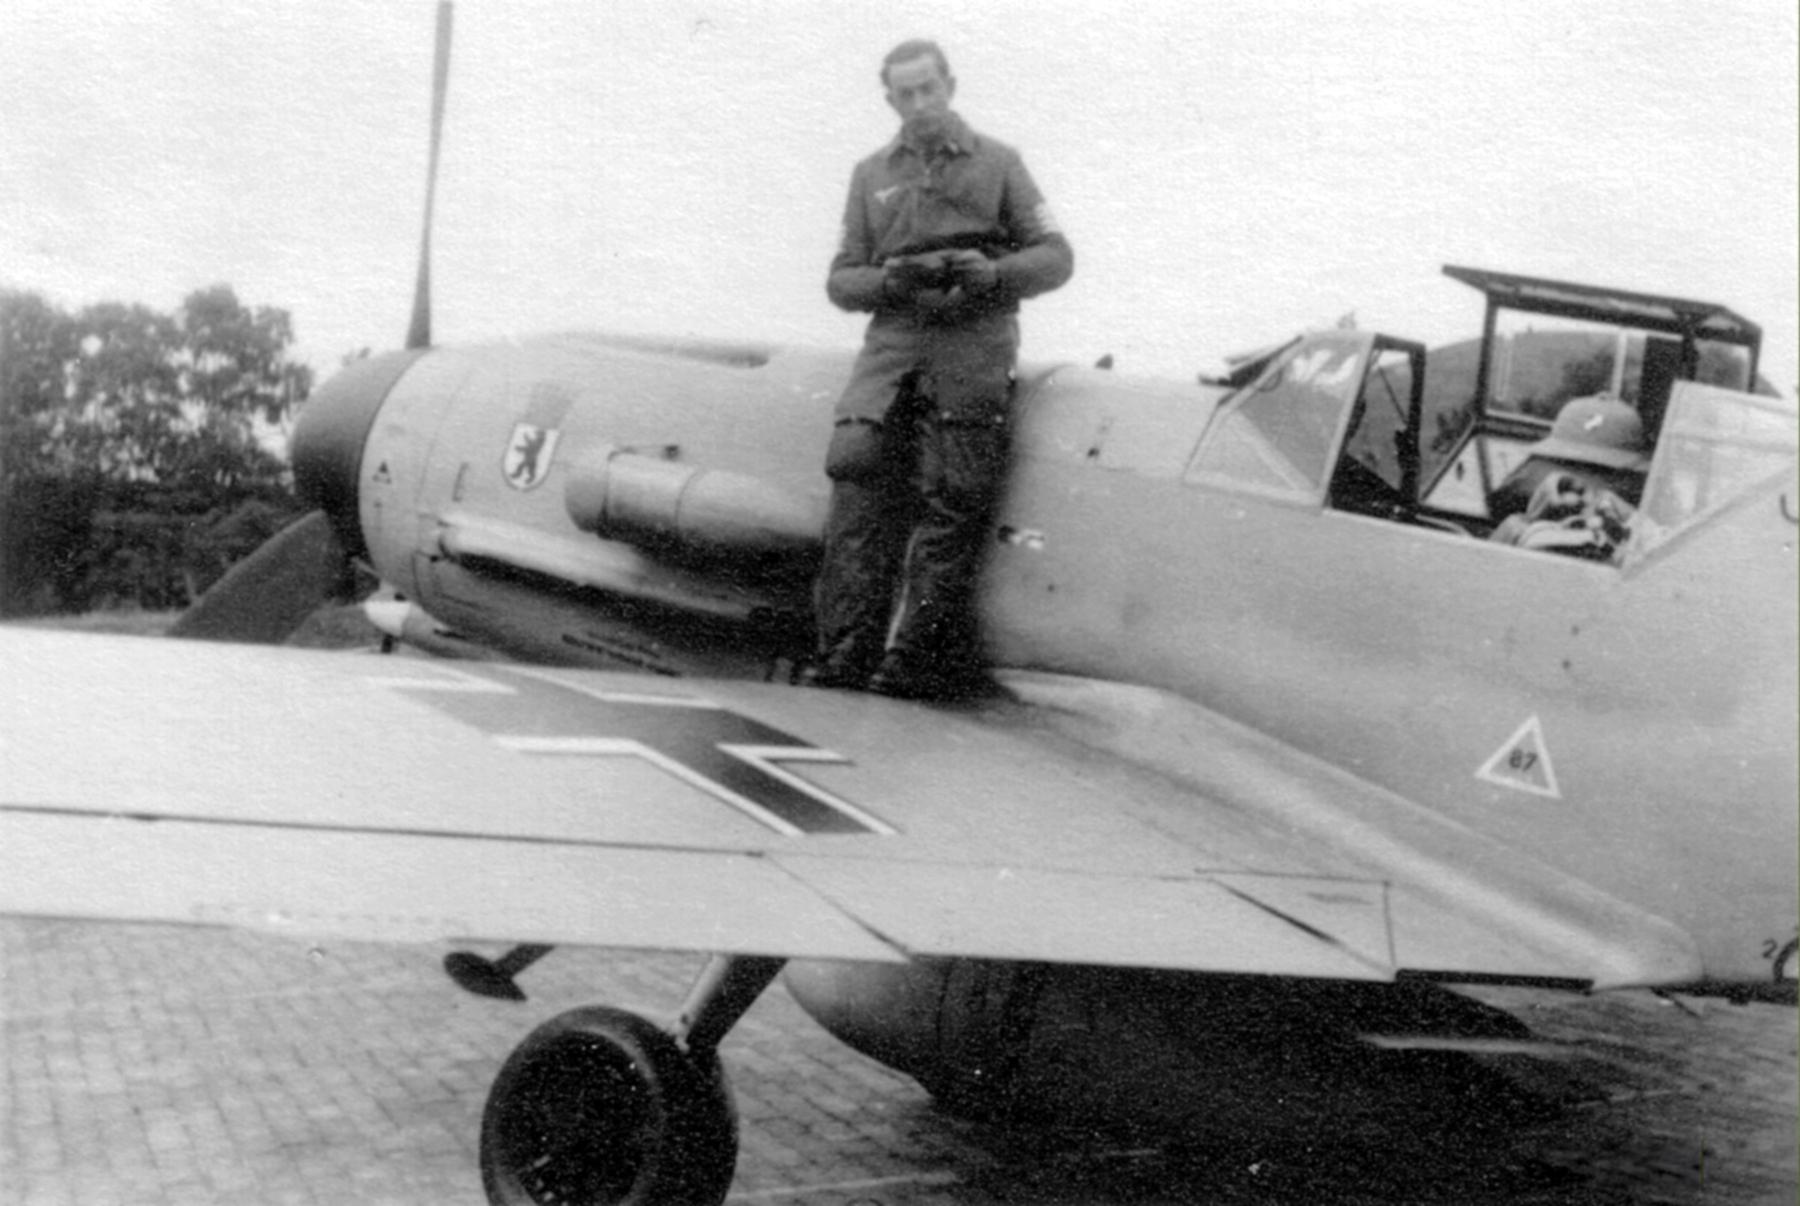 Messerschmitt Bf 109F4Trop 6.JG27 Erich Krenzke prior to ferry flight Doberitz 31st May 1942 ebay1